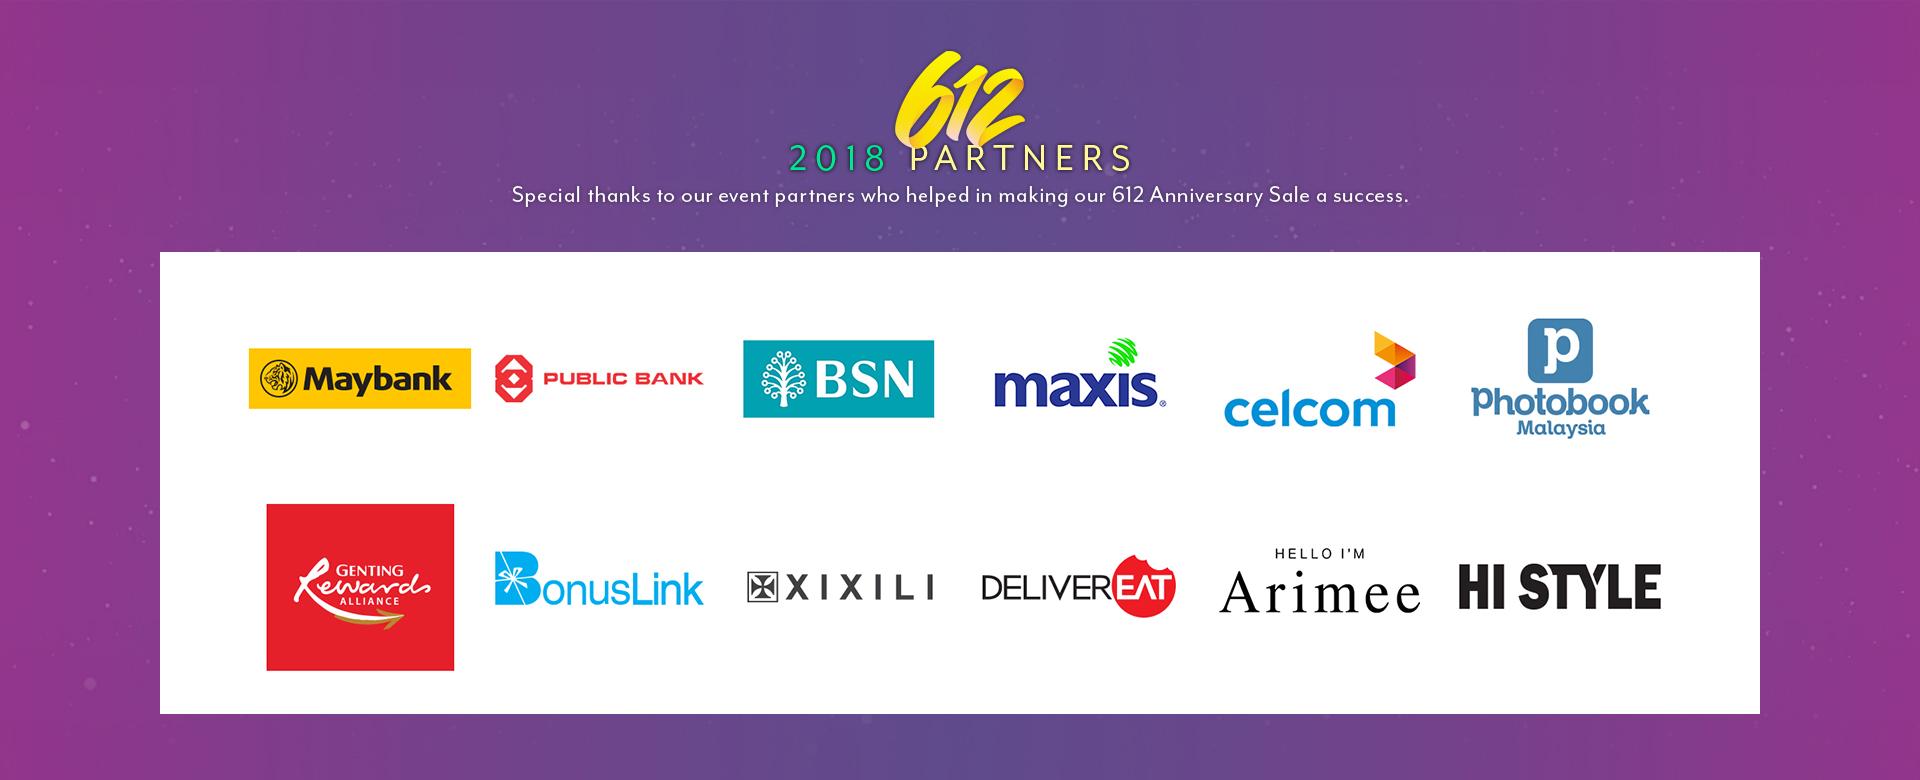 612 Partnerships Title